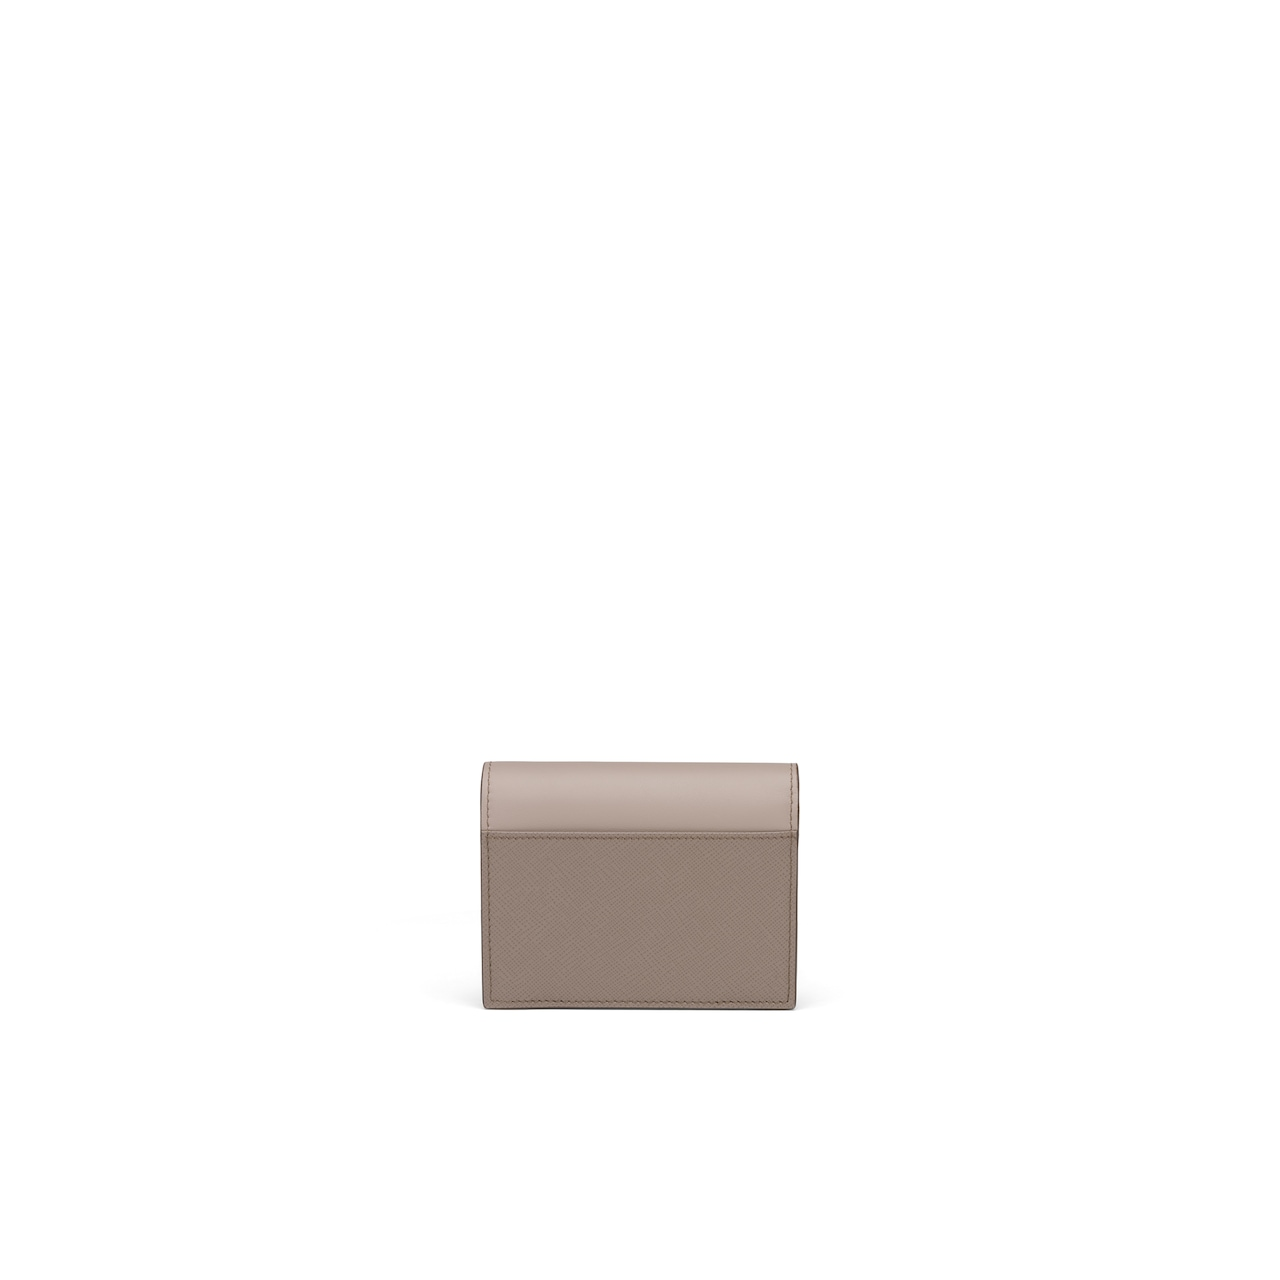 Prada Small leather wallet 5